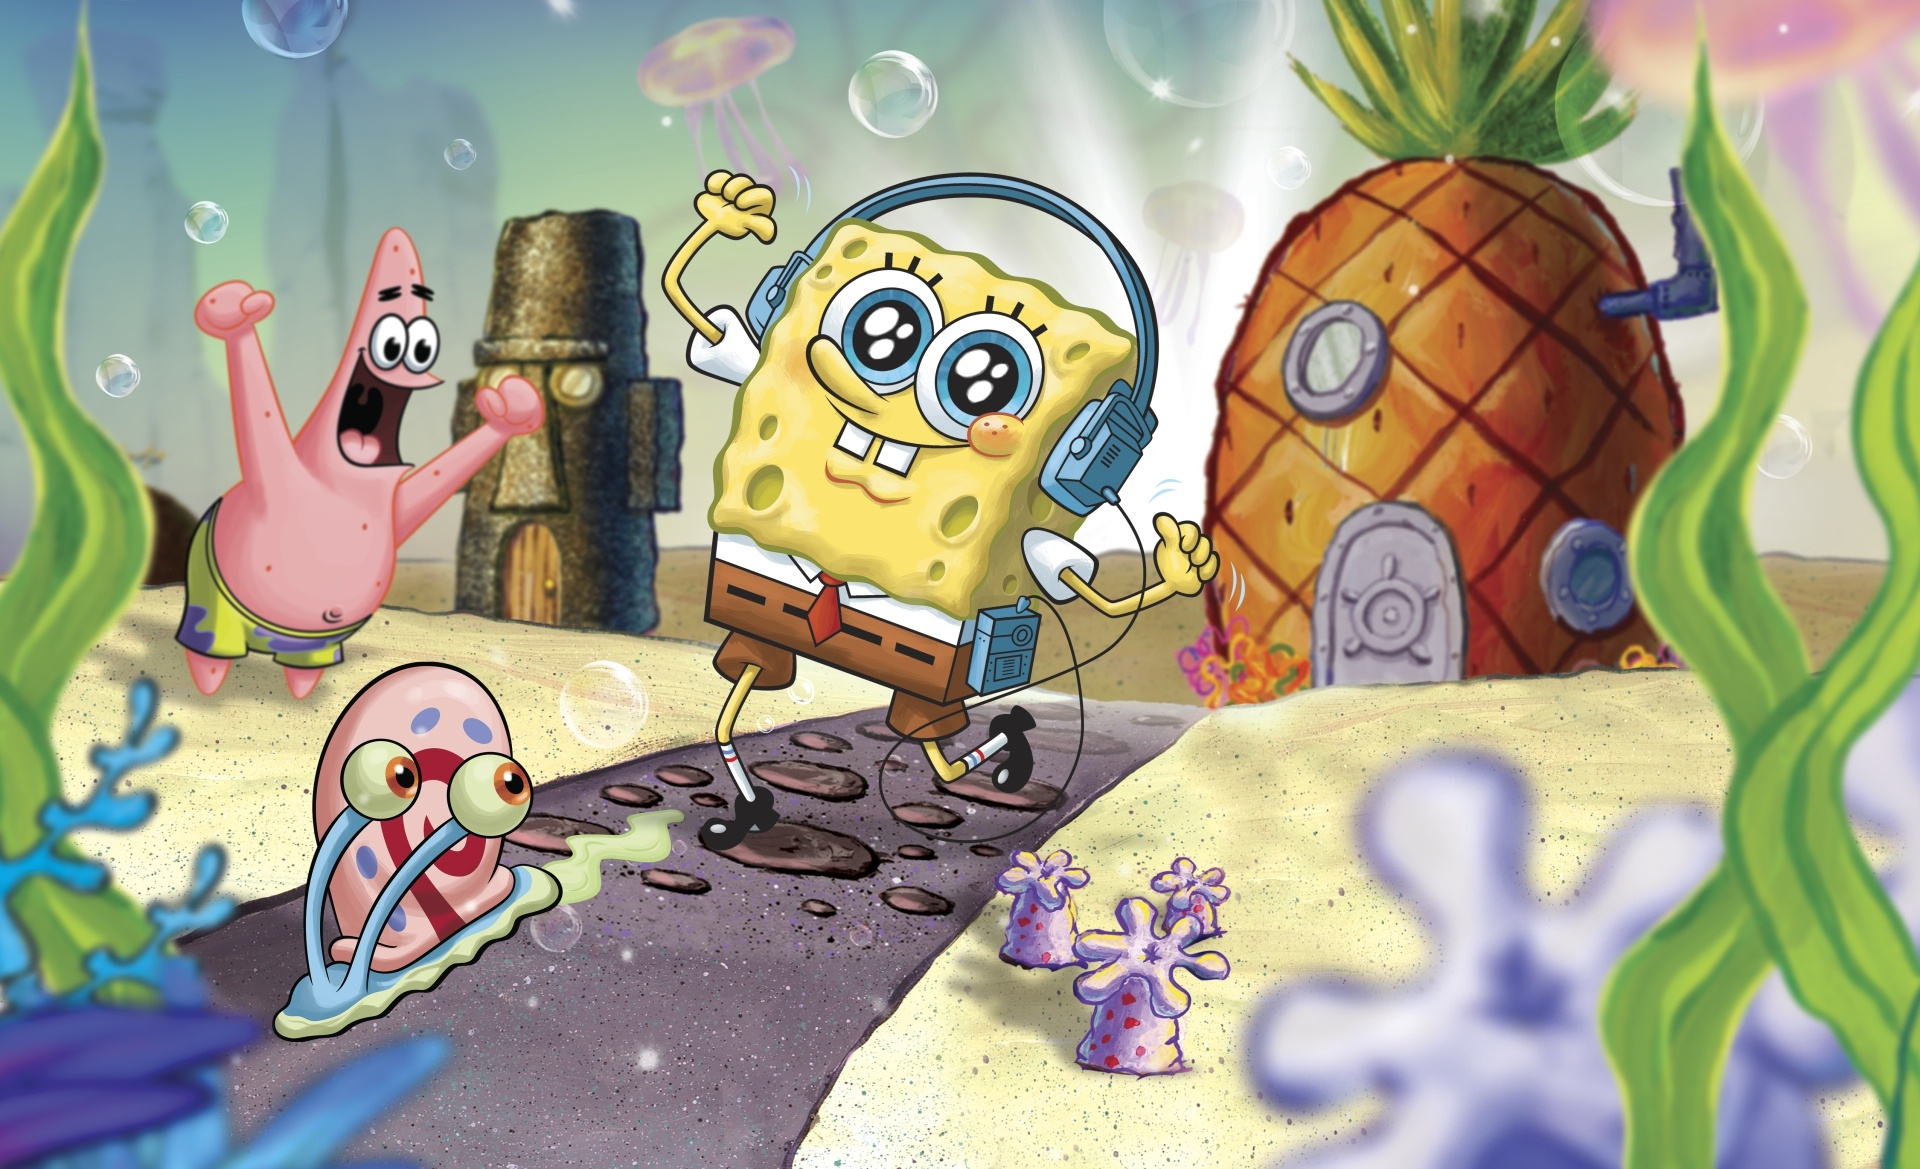 Sponge computer background